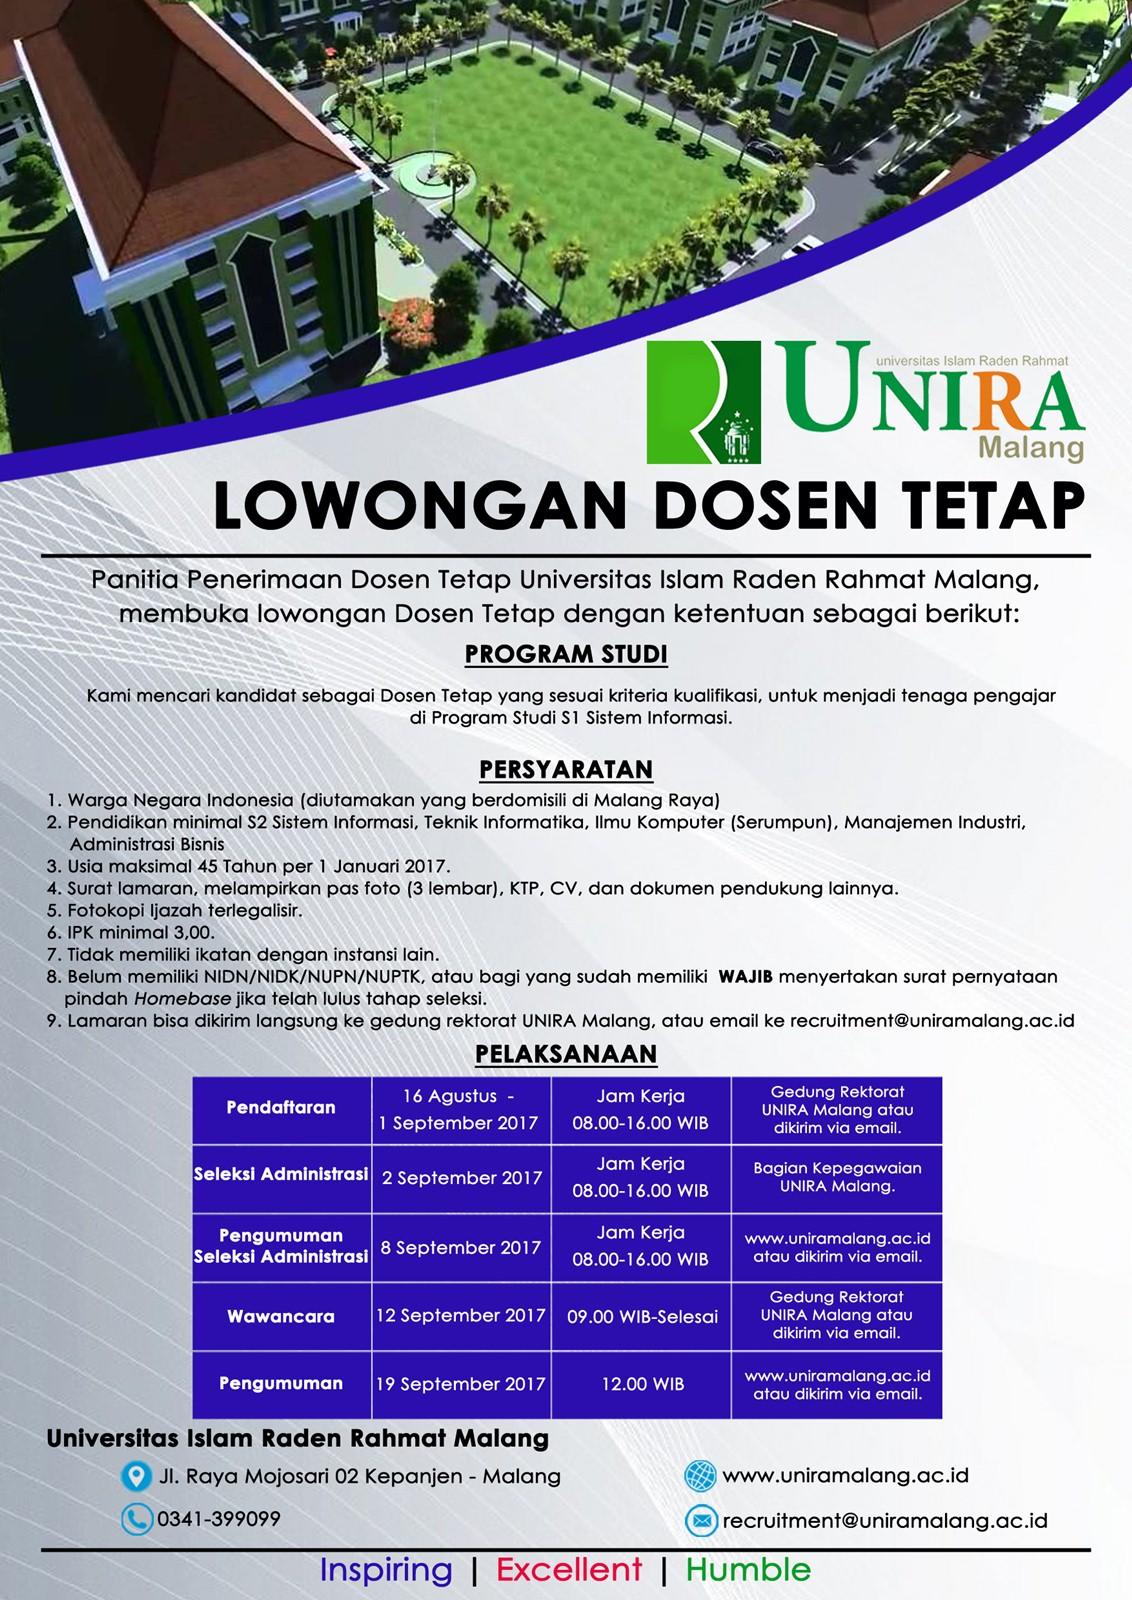 Lowongan Dosen Tetap Universitas Raden Rahmad (UNIRA) Malang 2017